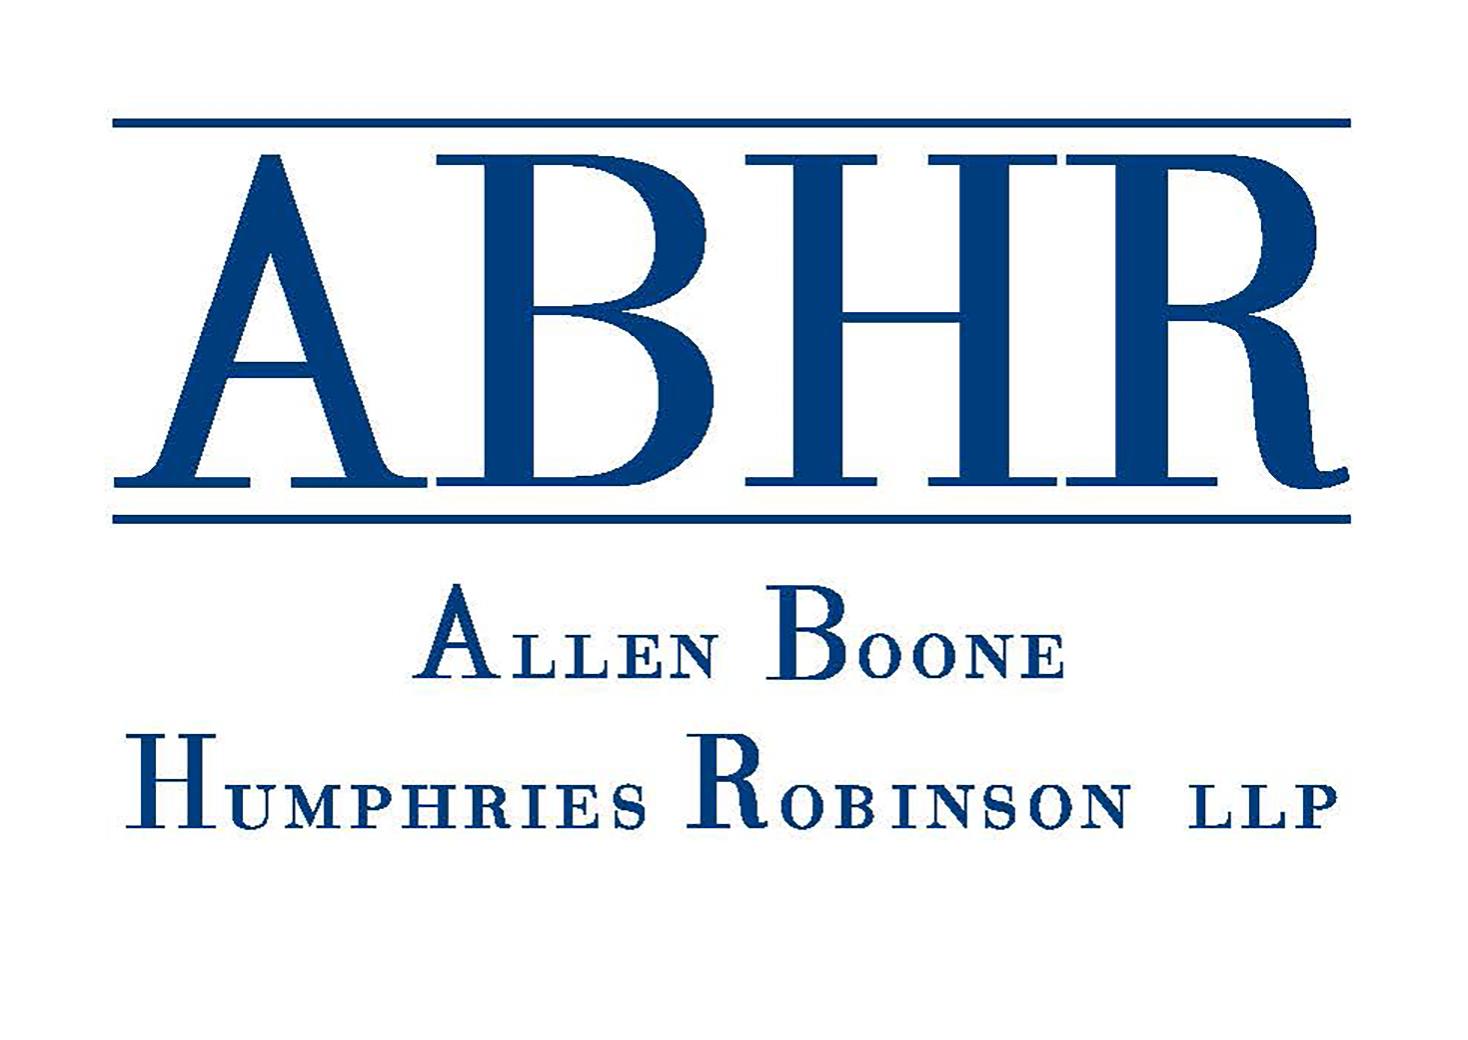 Allen Boone Humphries Robinson LLP